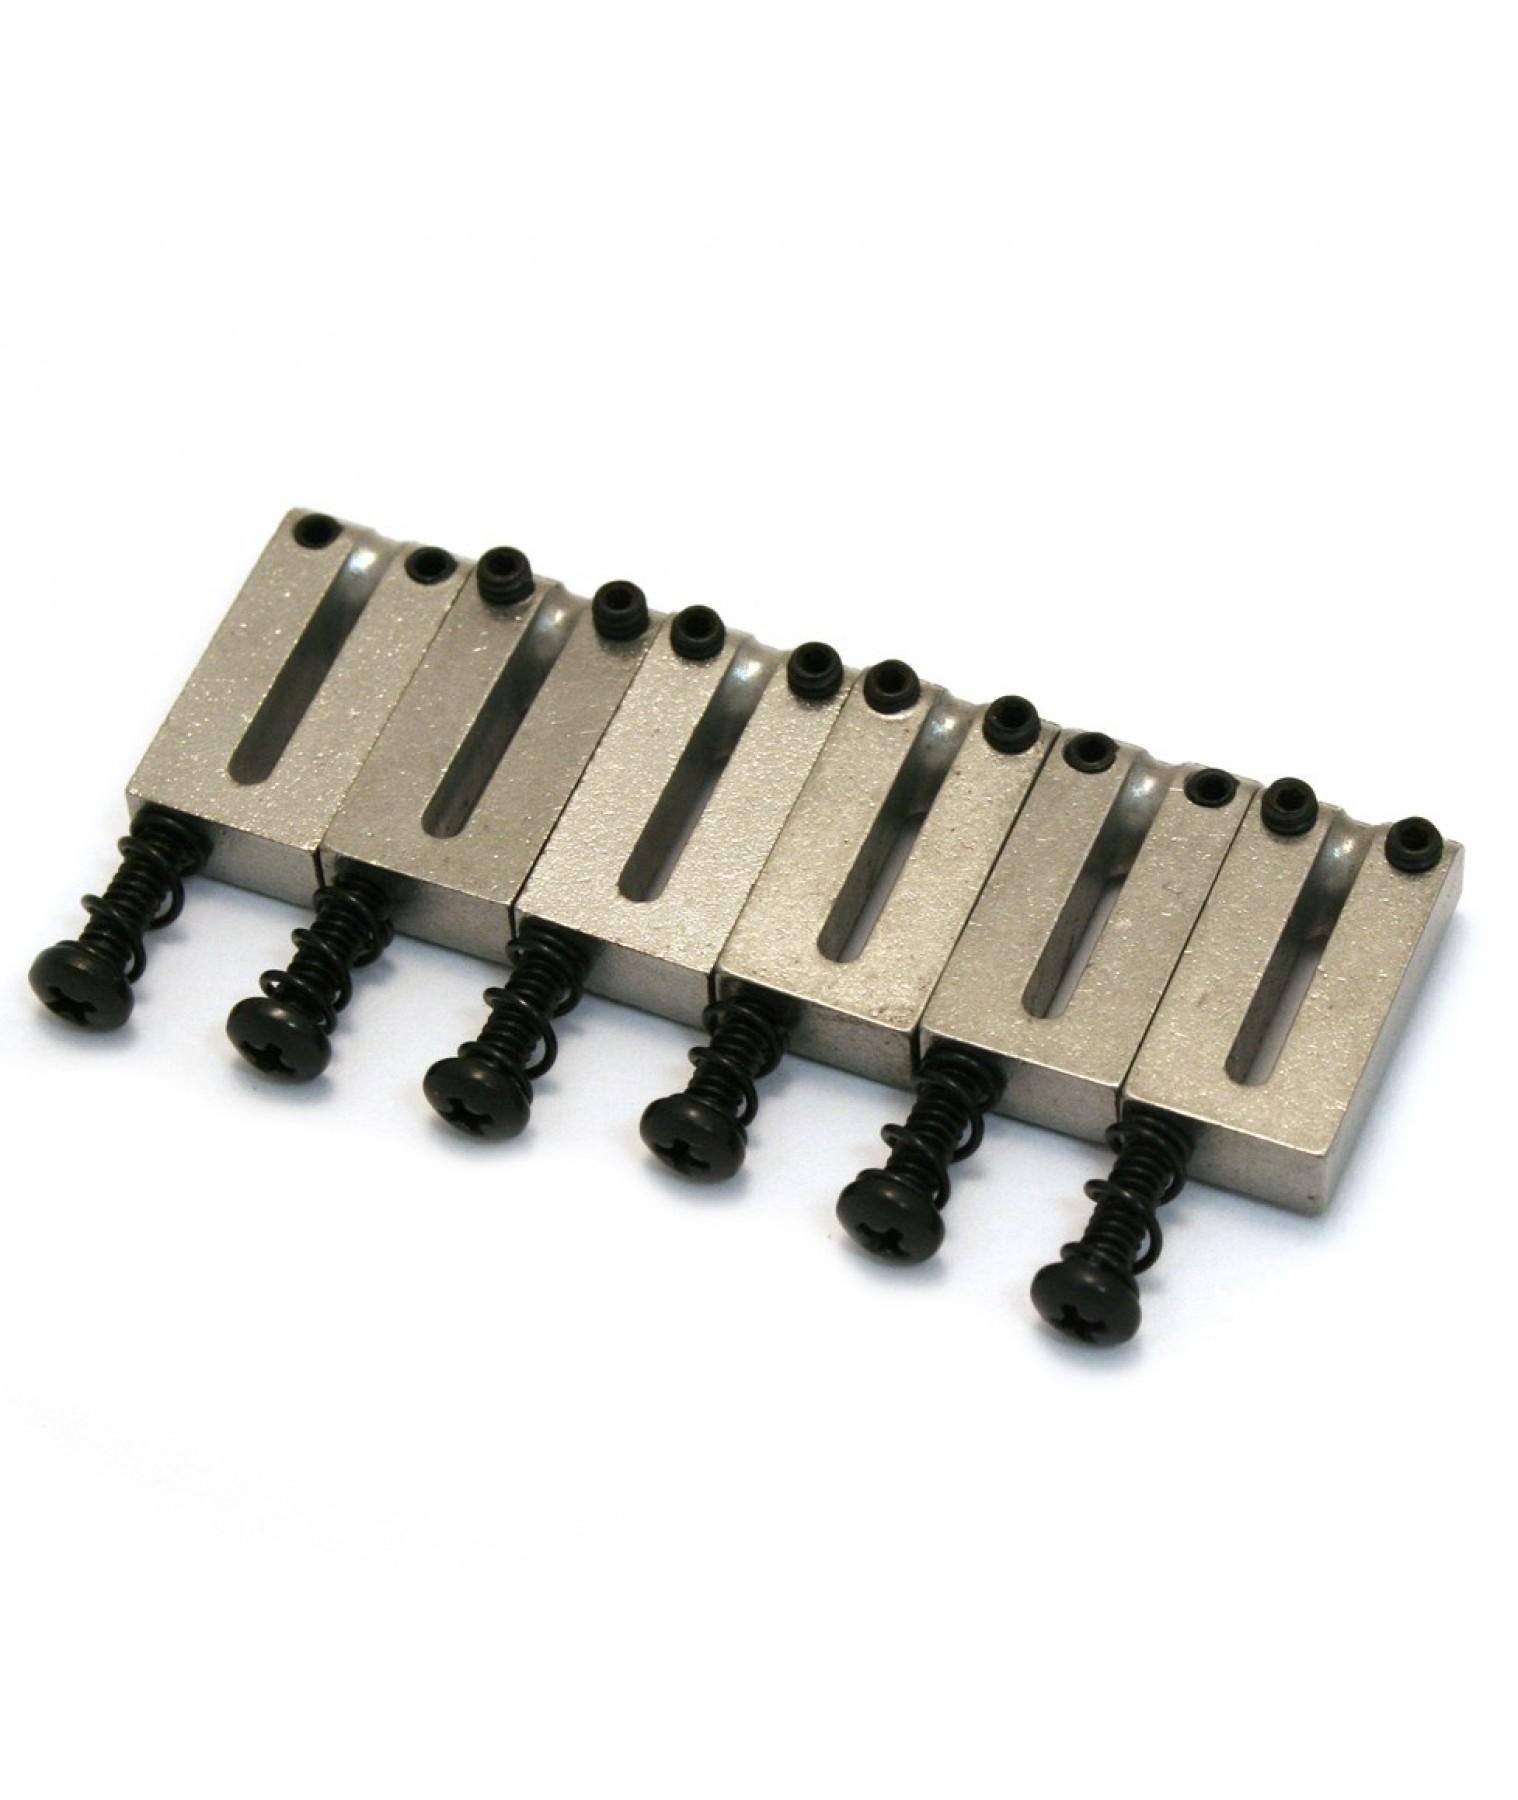 fender bridge saddles american std strat tele w screws x 6 0990840000. Black Bedroom Furniture Sets. Home Design Ideas